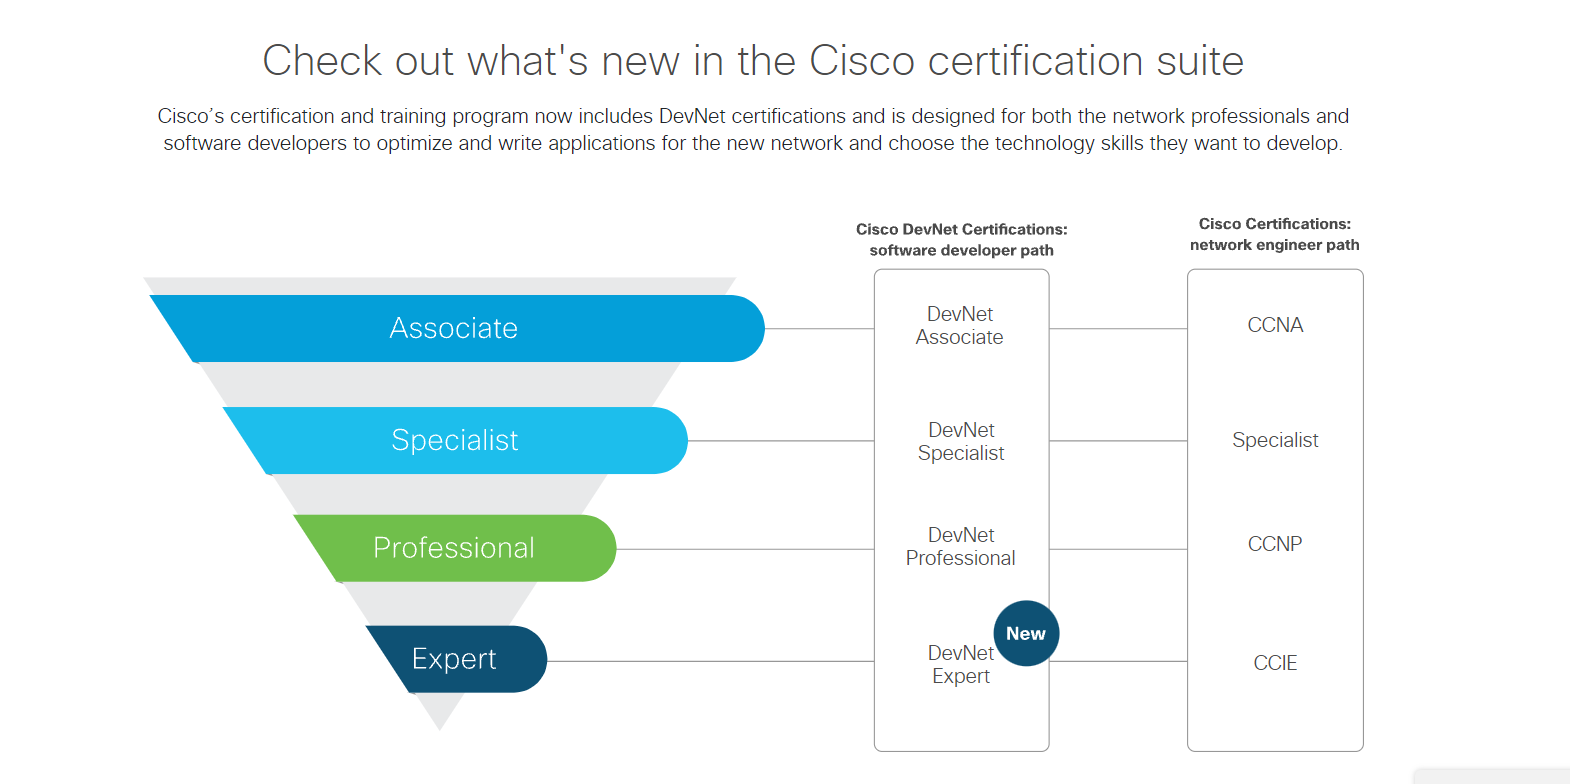 New DevNet Expert certification has been added to the Cisco certification suite.